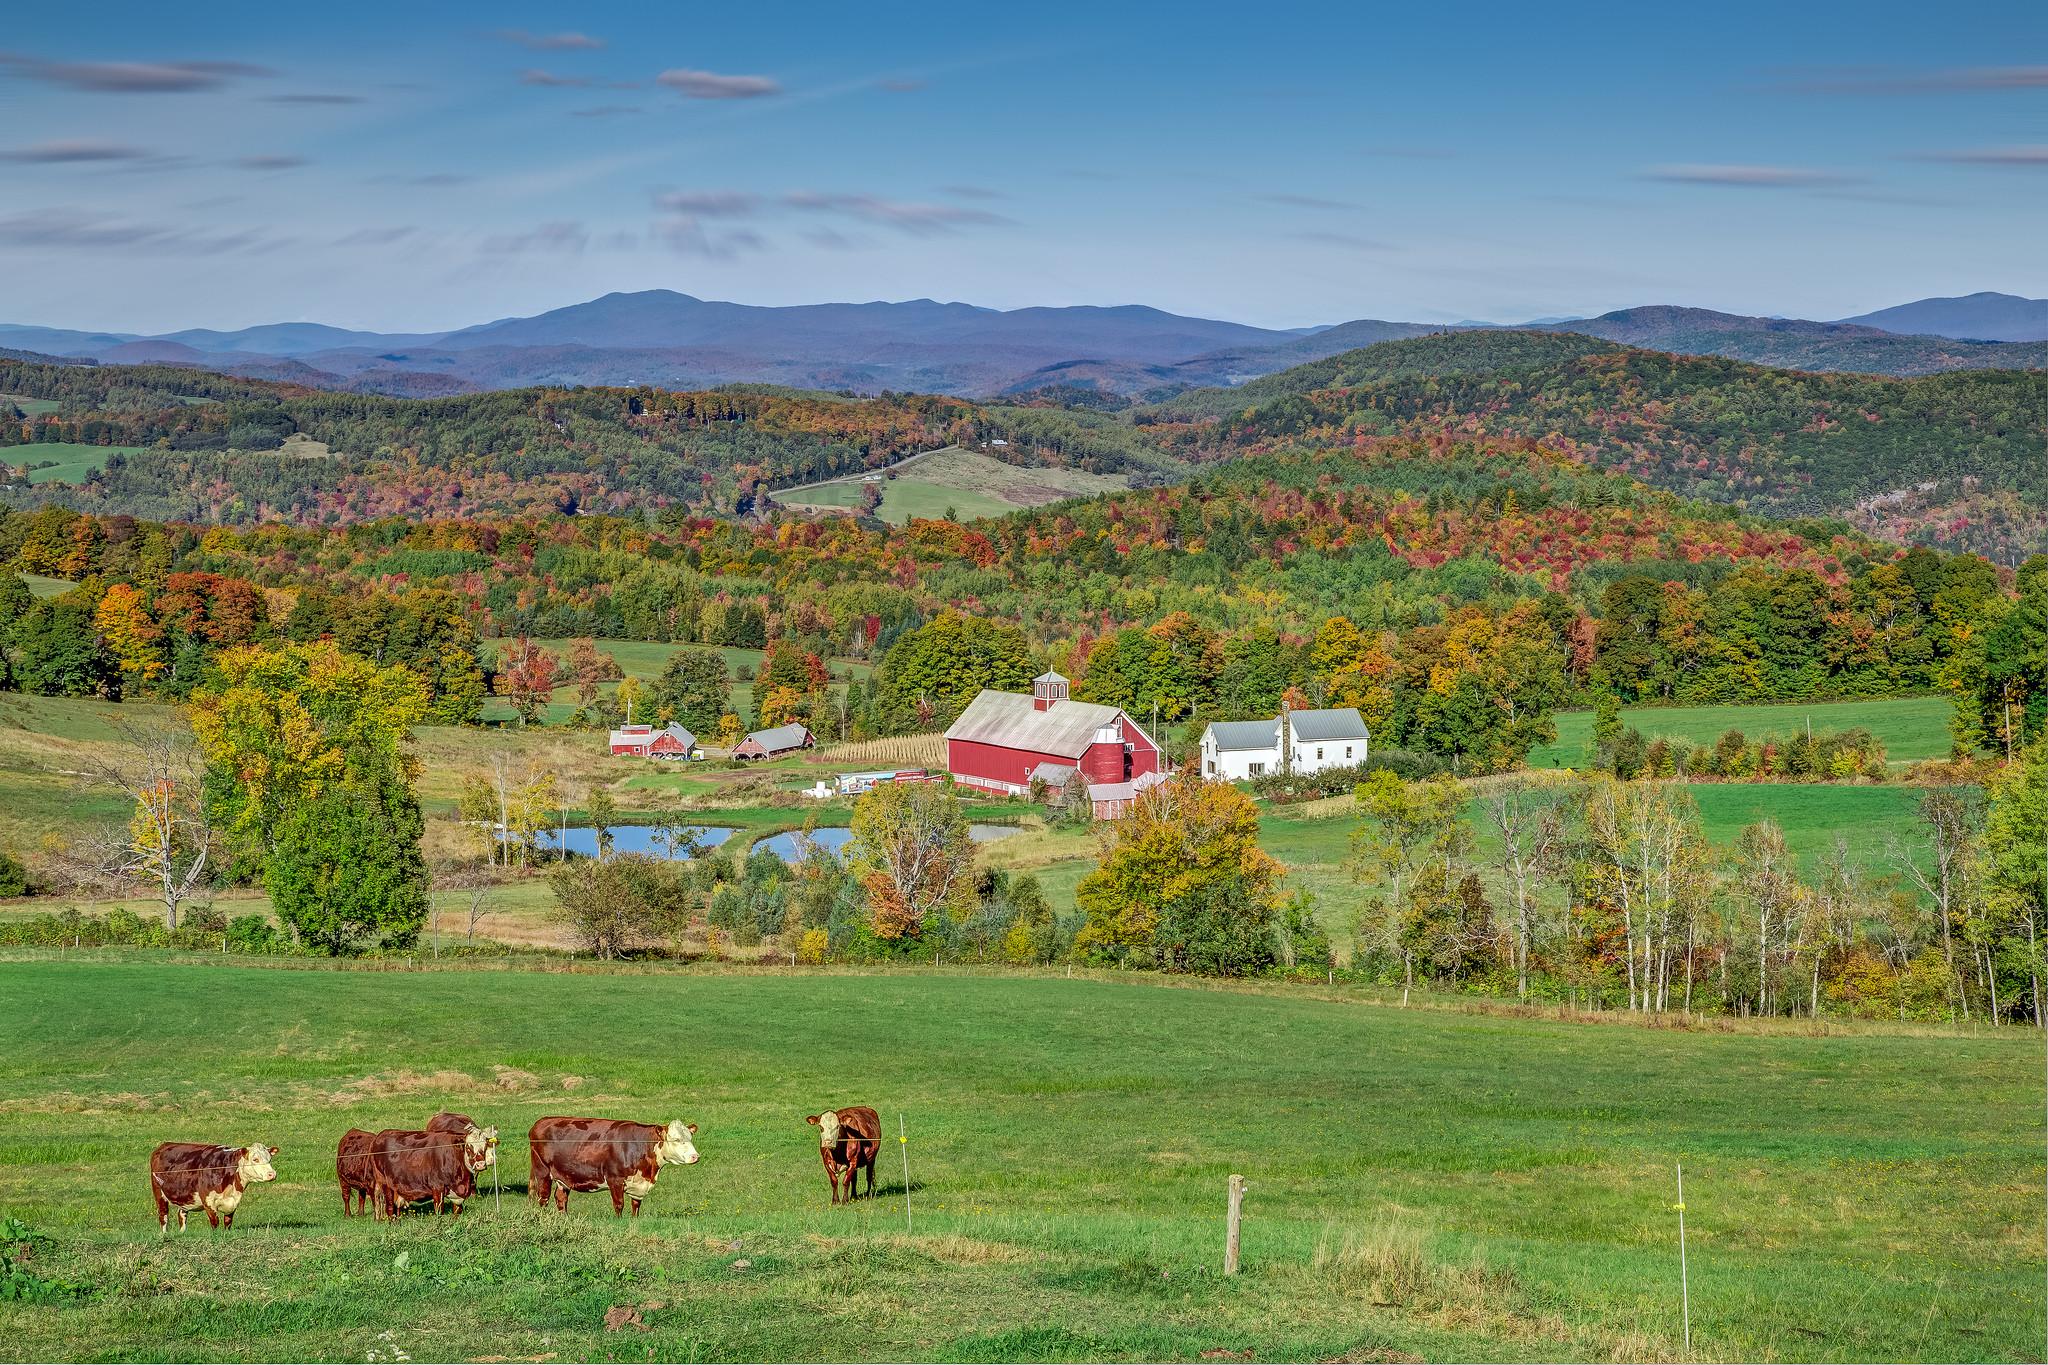 Нью-Гемпшир, Новая Англия, Вермонт